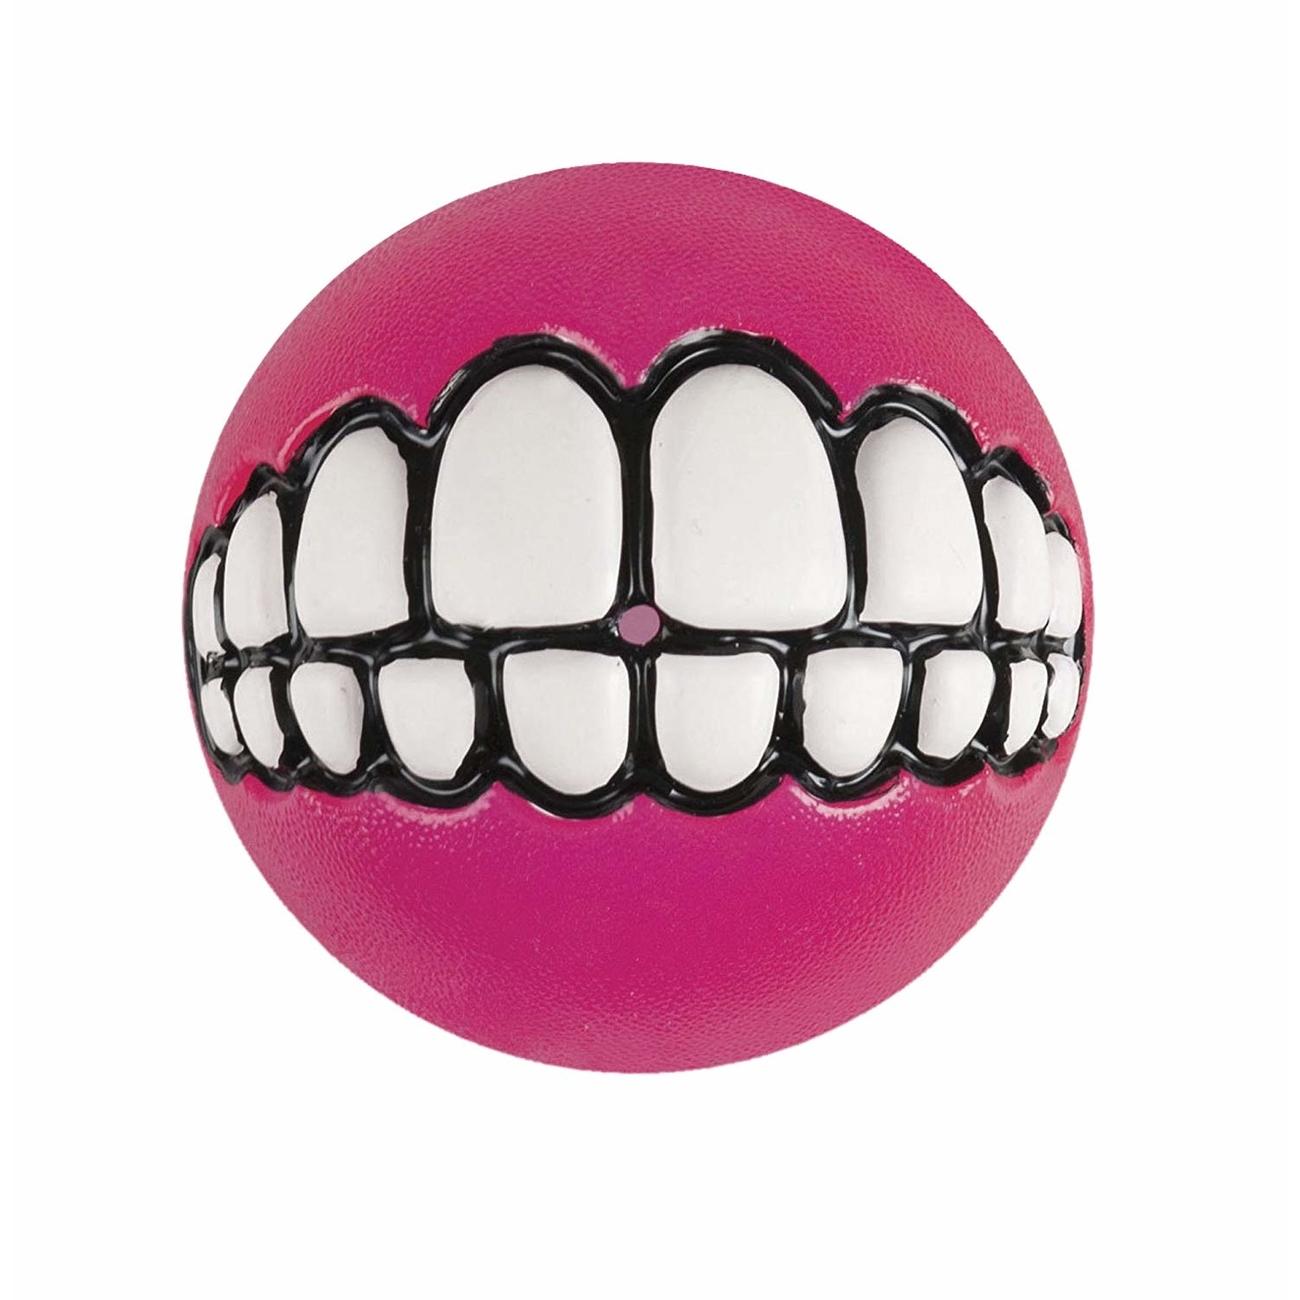 Rogz Grinz Ball für Hunde, Bild 3